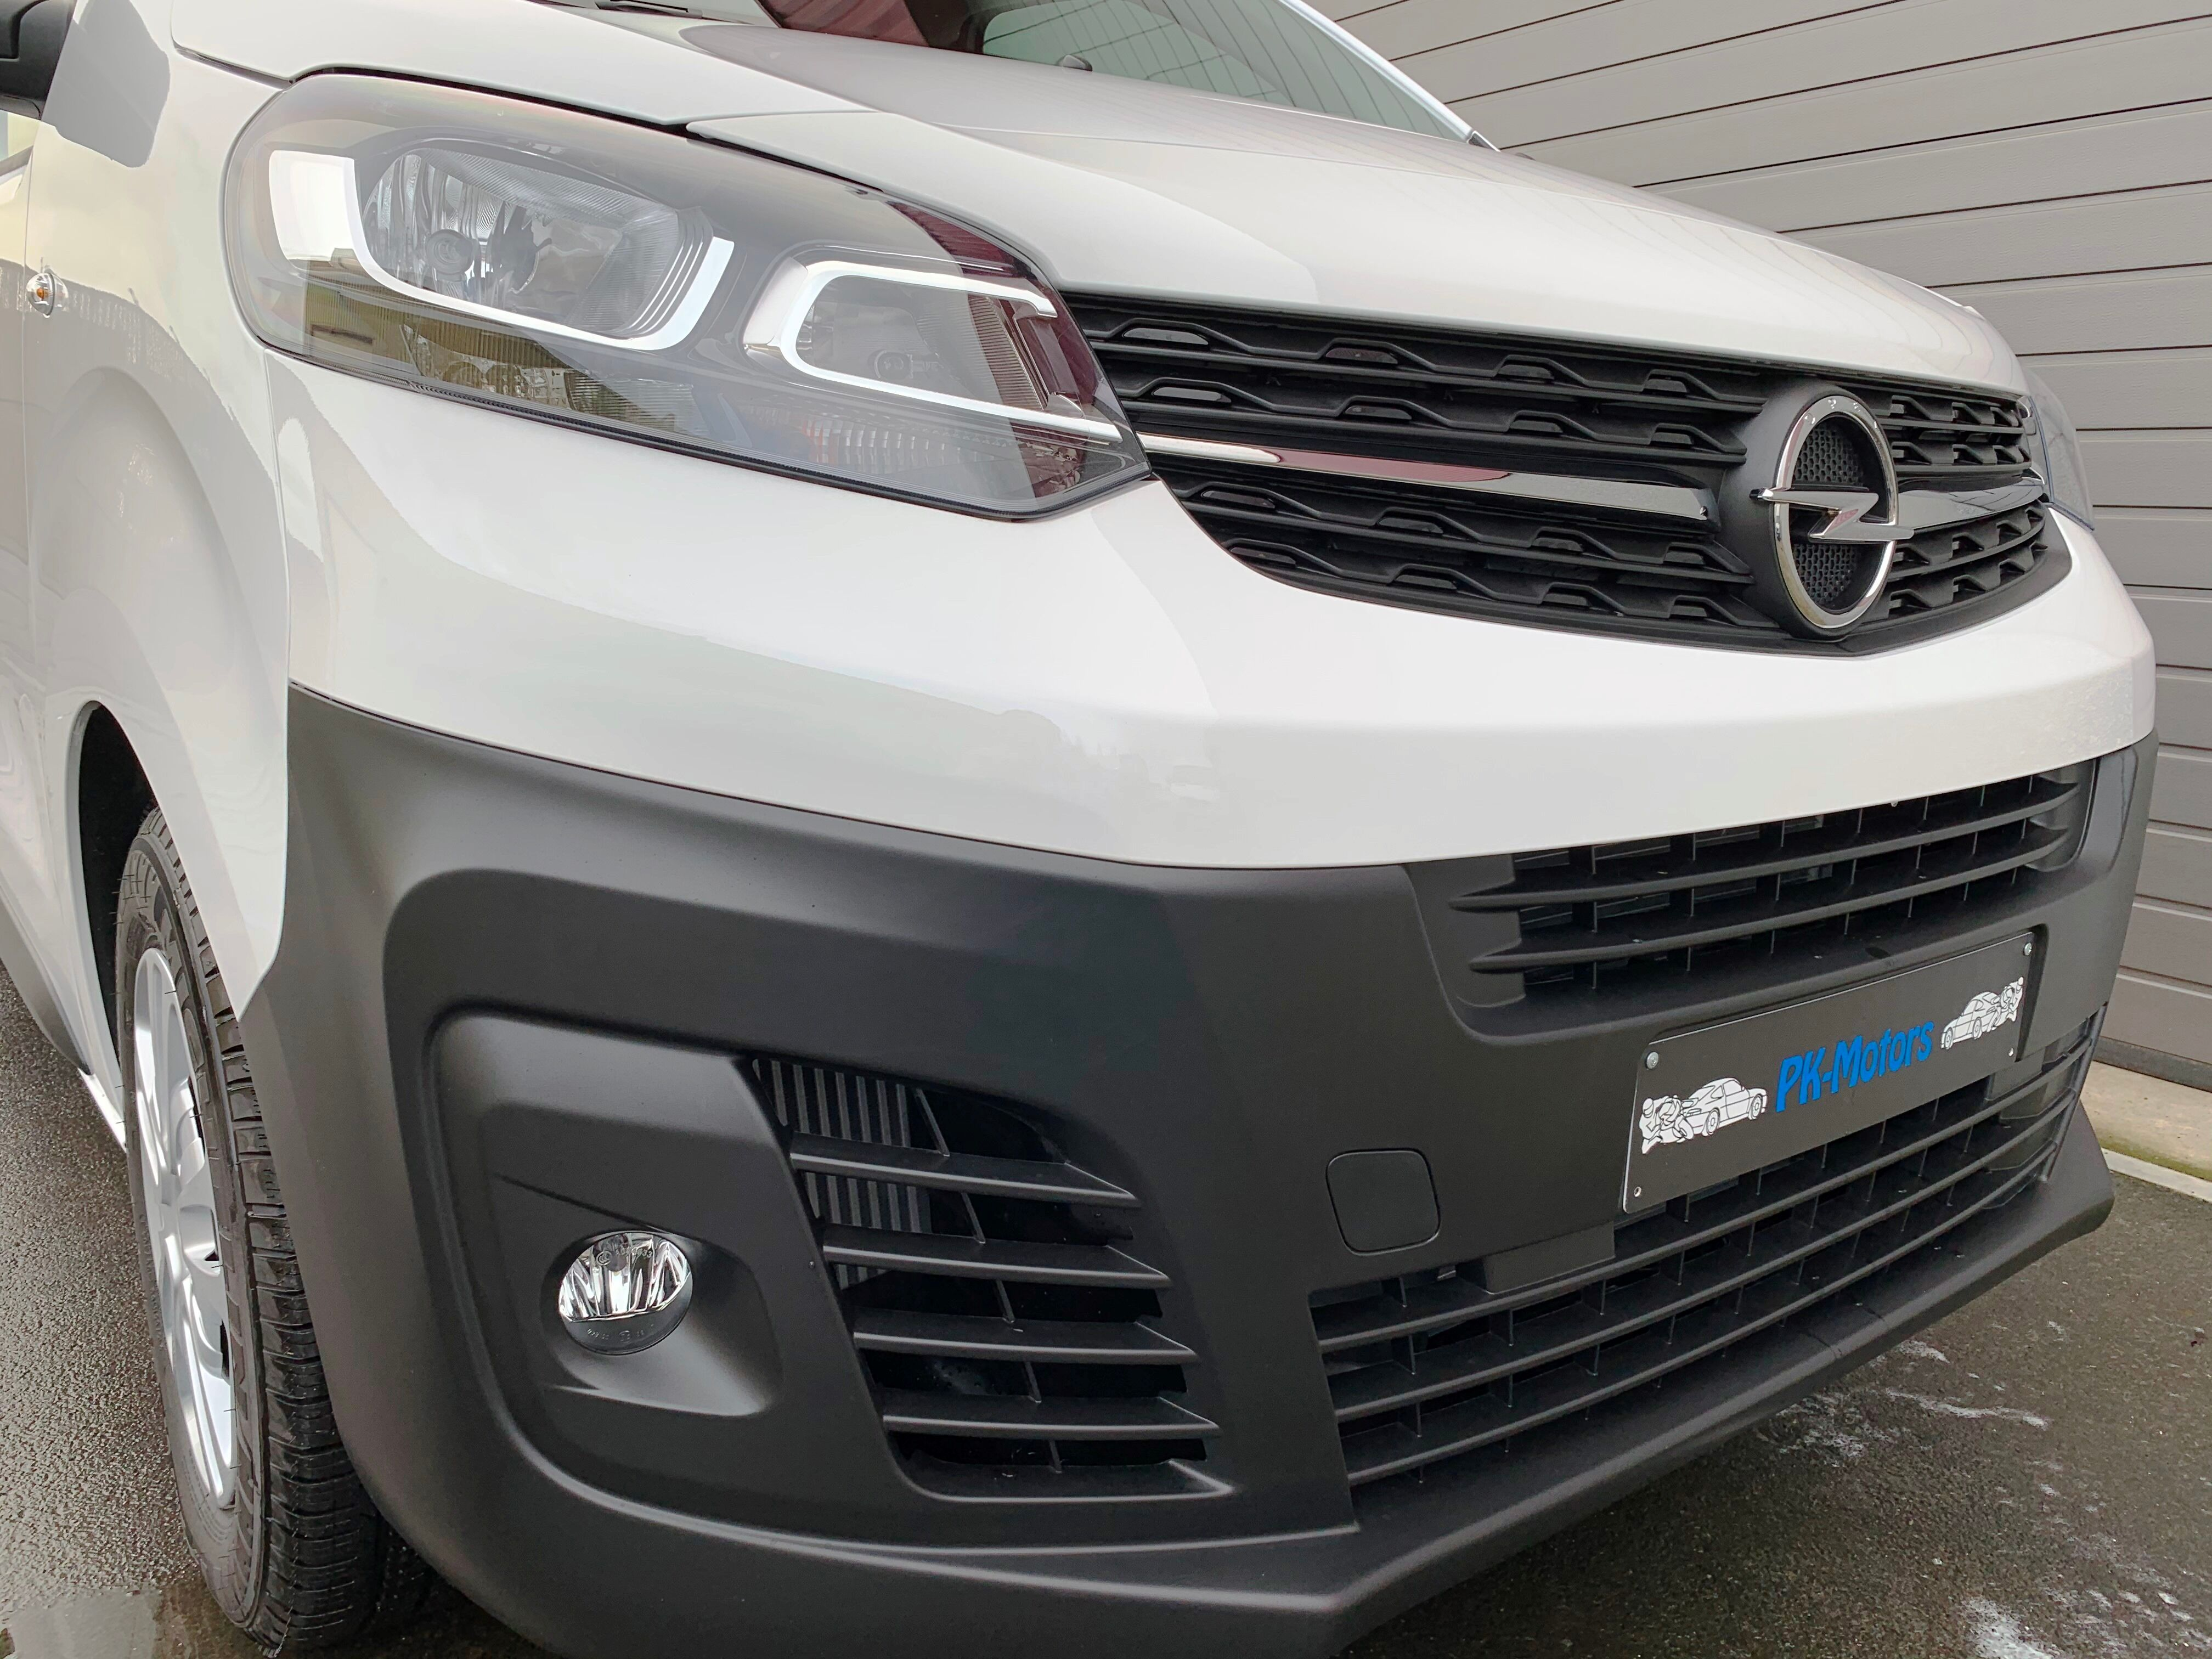 Opel Vivaro 2.0D 122PK Edition L3H1 NIEUW in stock 35% korting 12/29